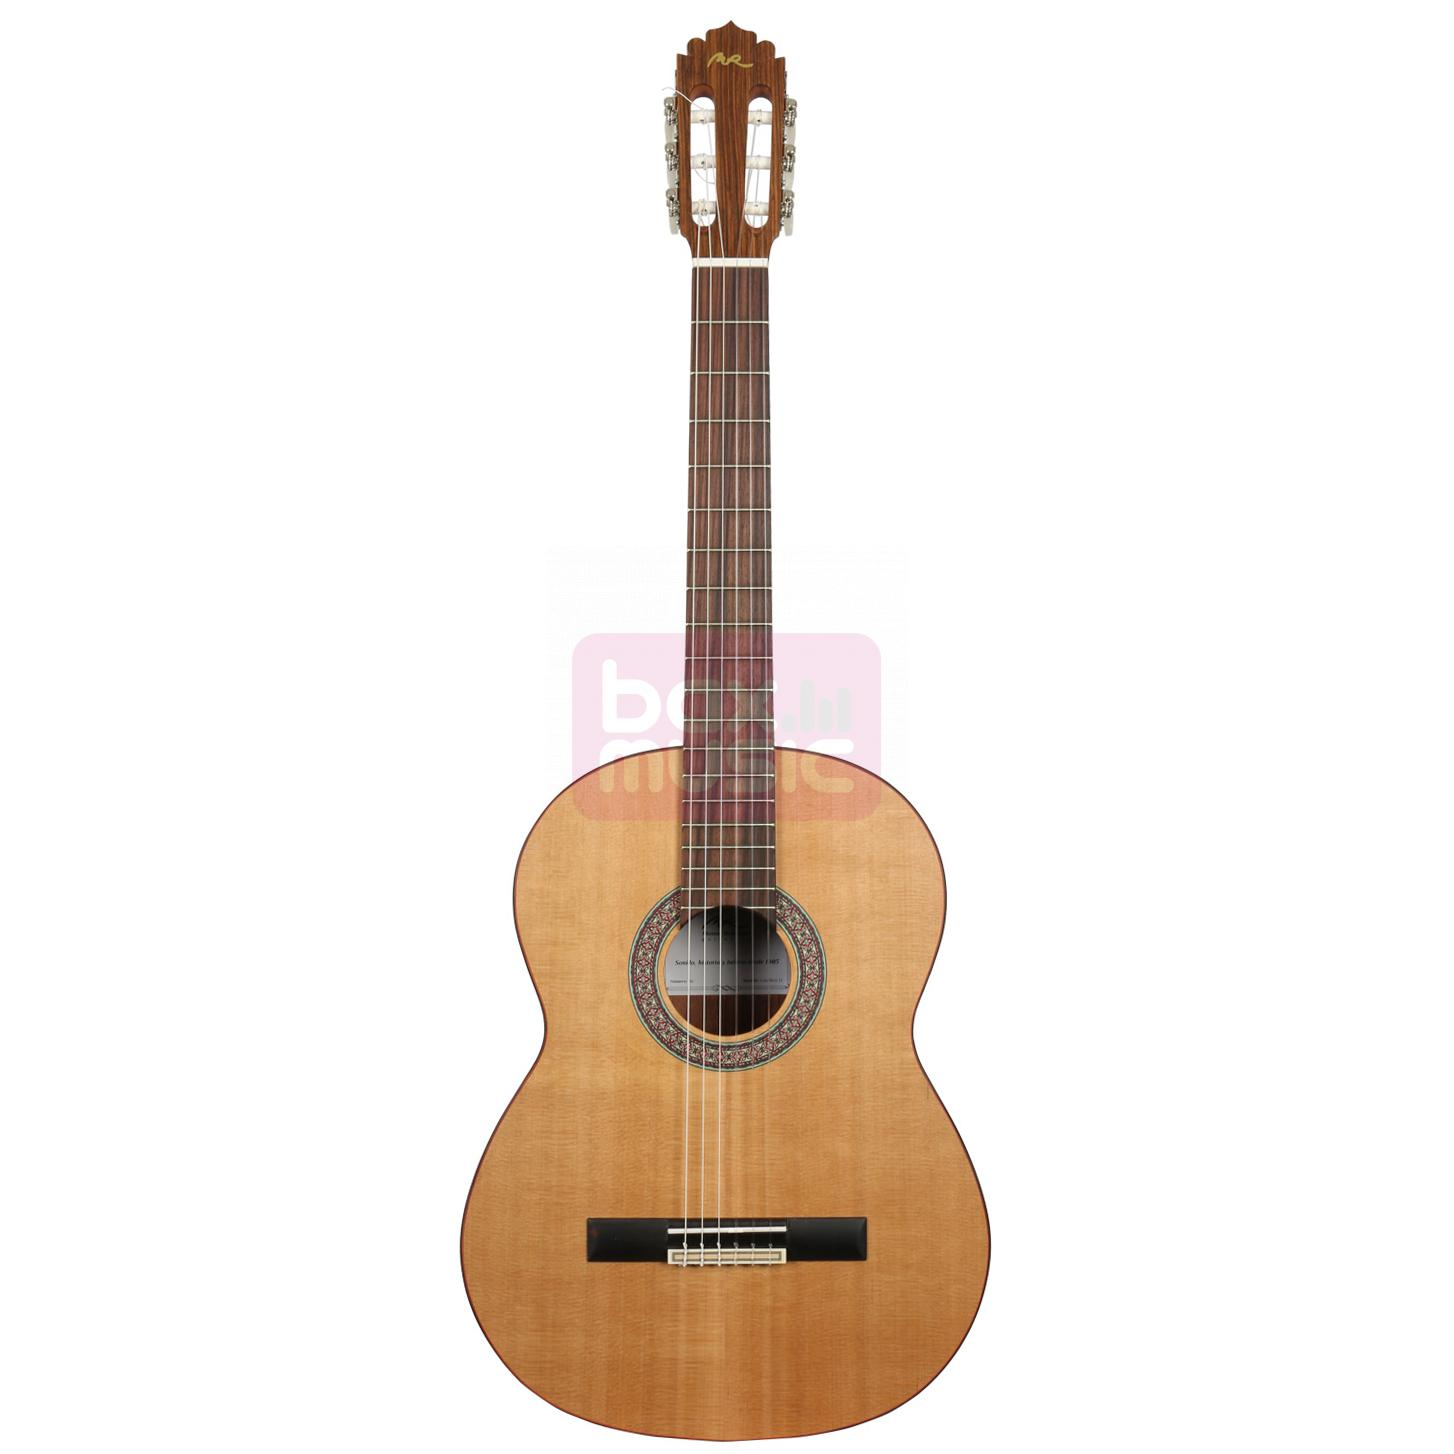 Manuel Rodriguez Nature Caballero 12 klassieke gitaar